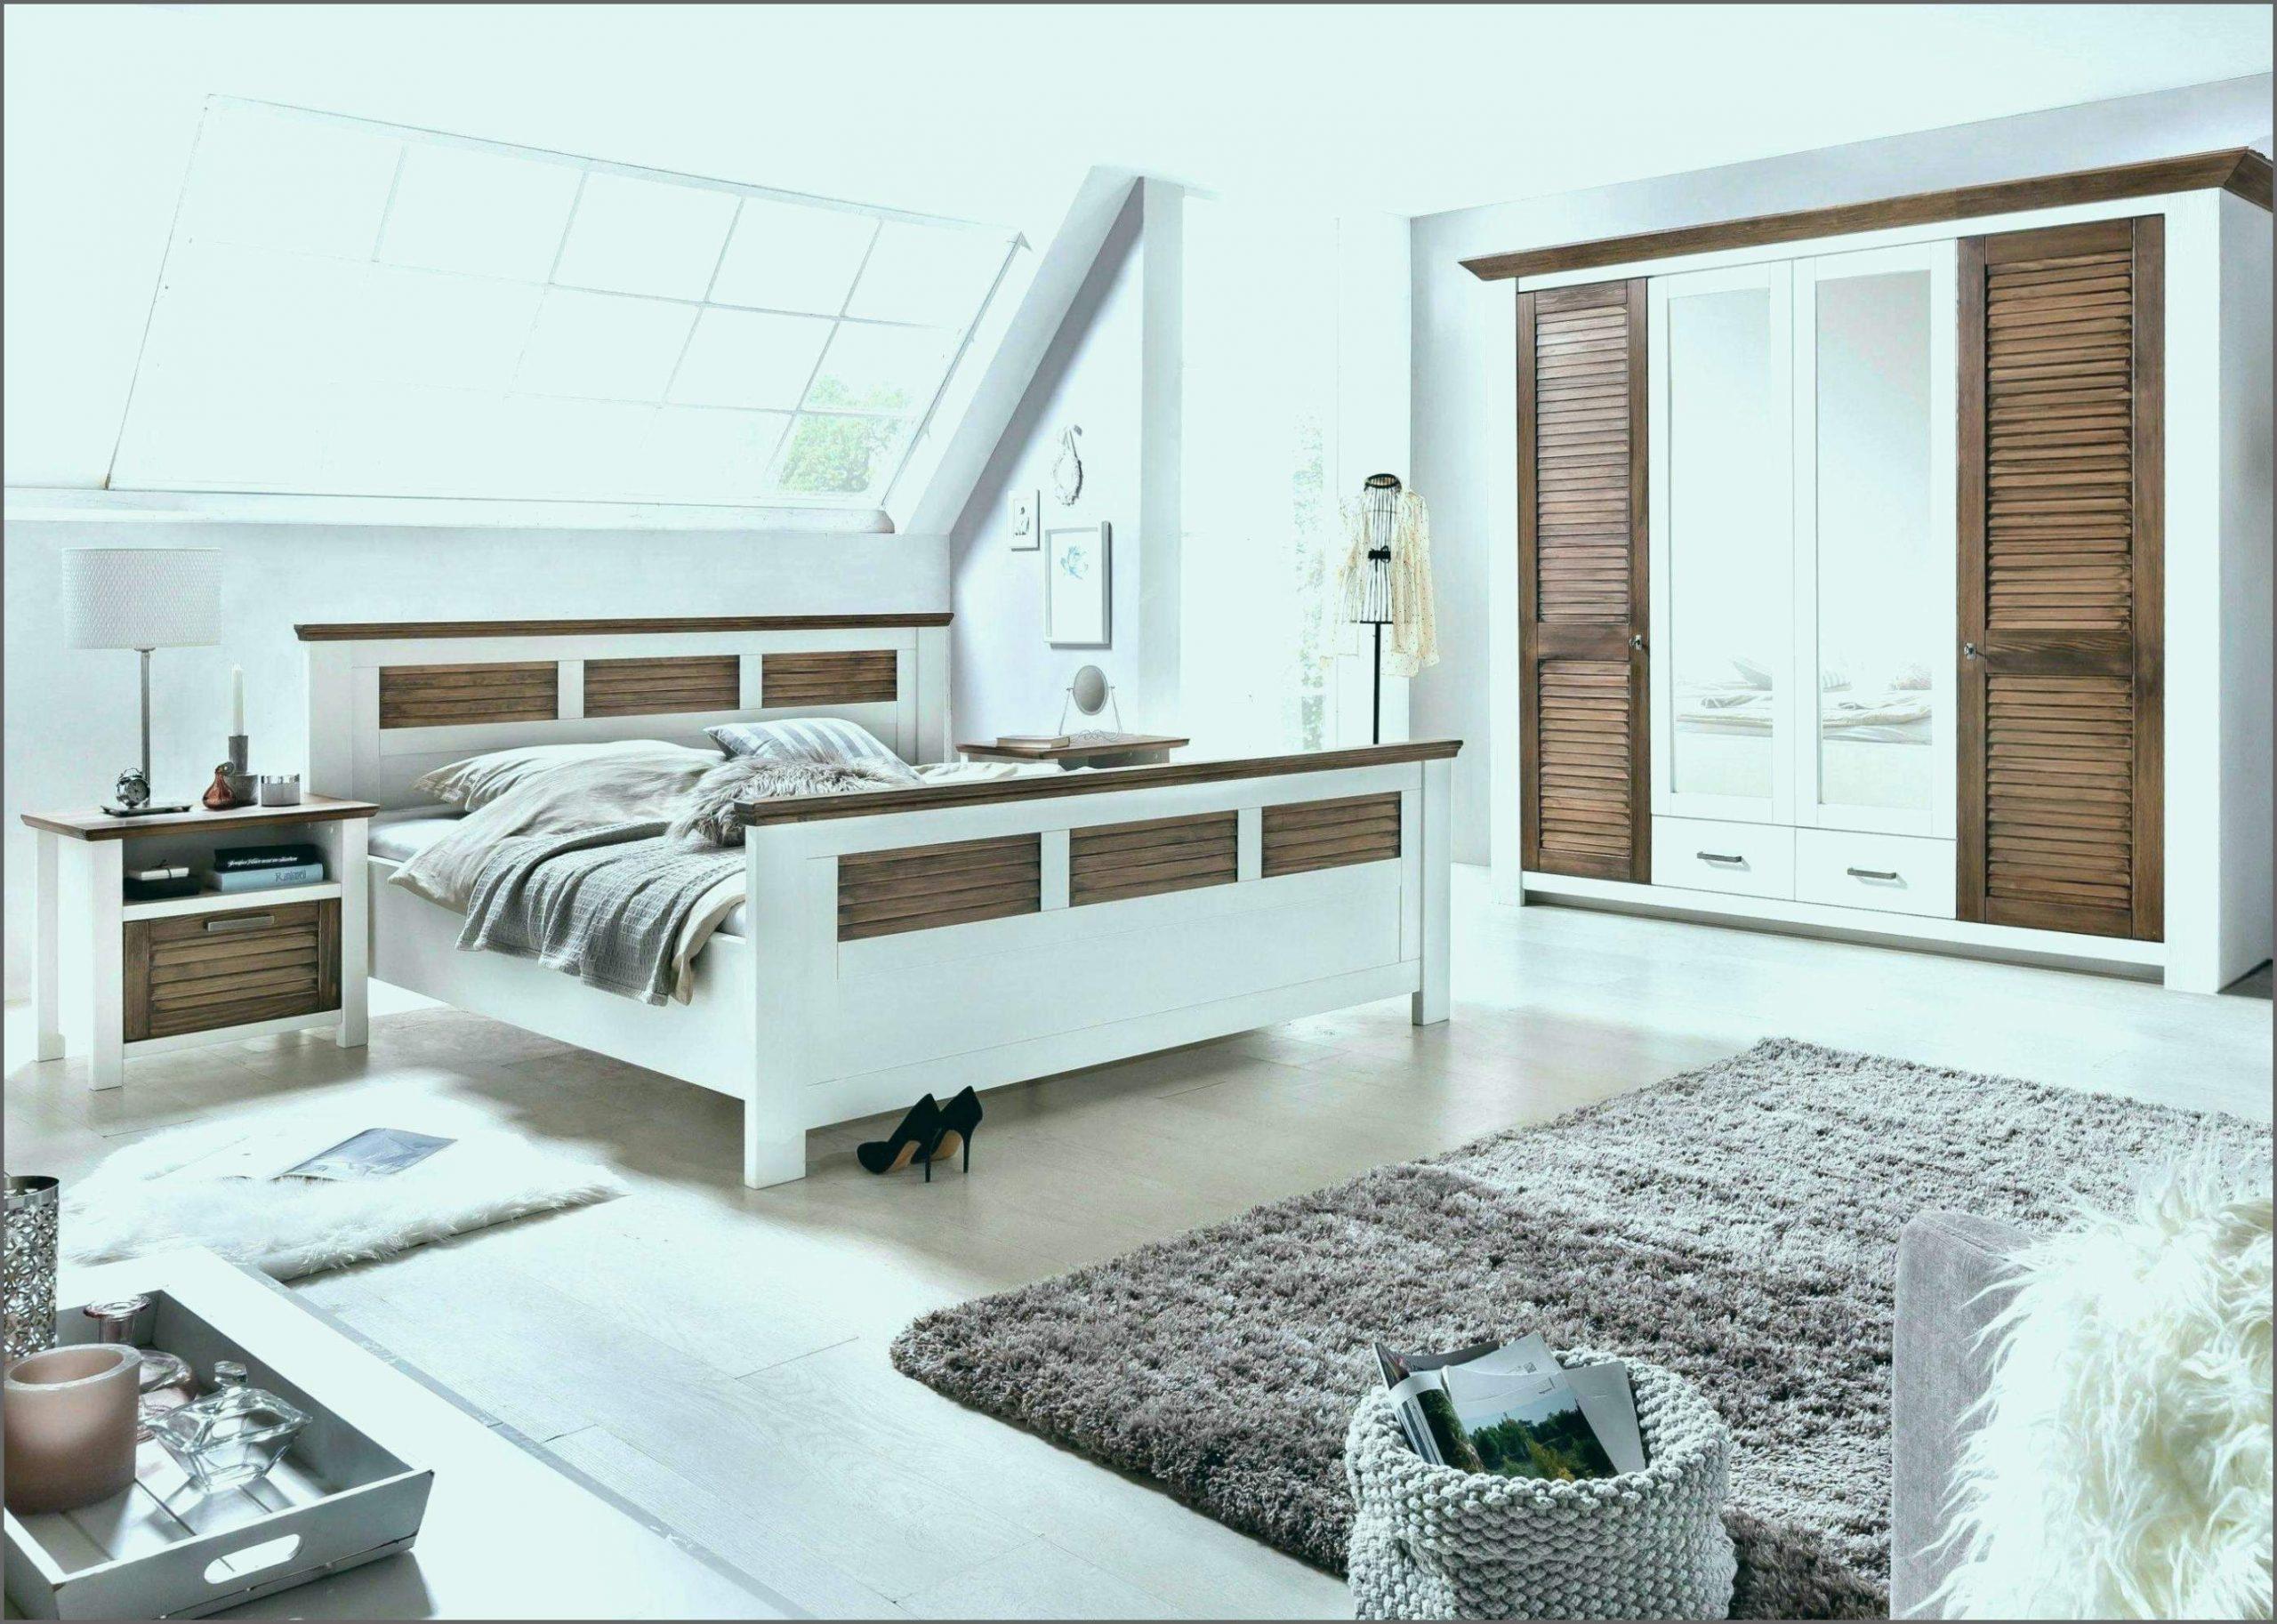 Full Size of Amazon Wohnzimmer Kommode Wohnzimmer Kommode Günstig Wohnzimmer Kommode Weiß Hochglanz Wohnzimmer Kommode Hochglanz Wohnzimmer Wohnzimmer Kommode